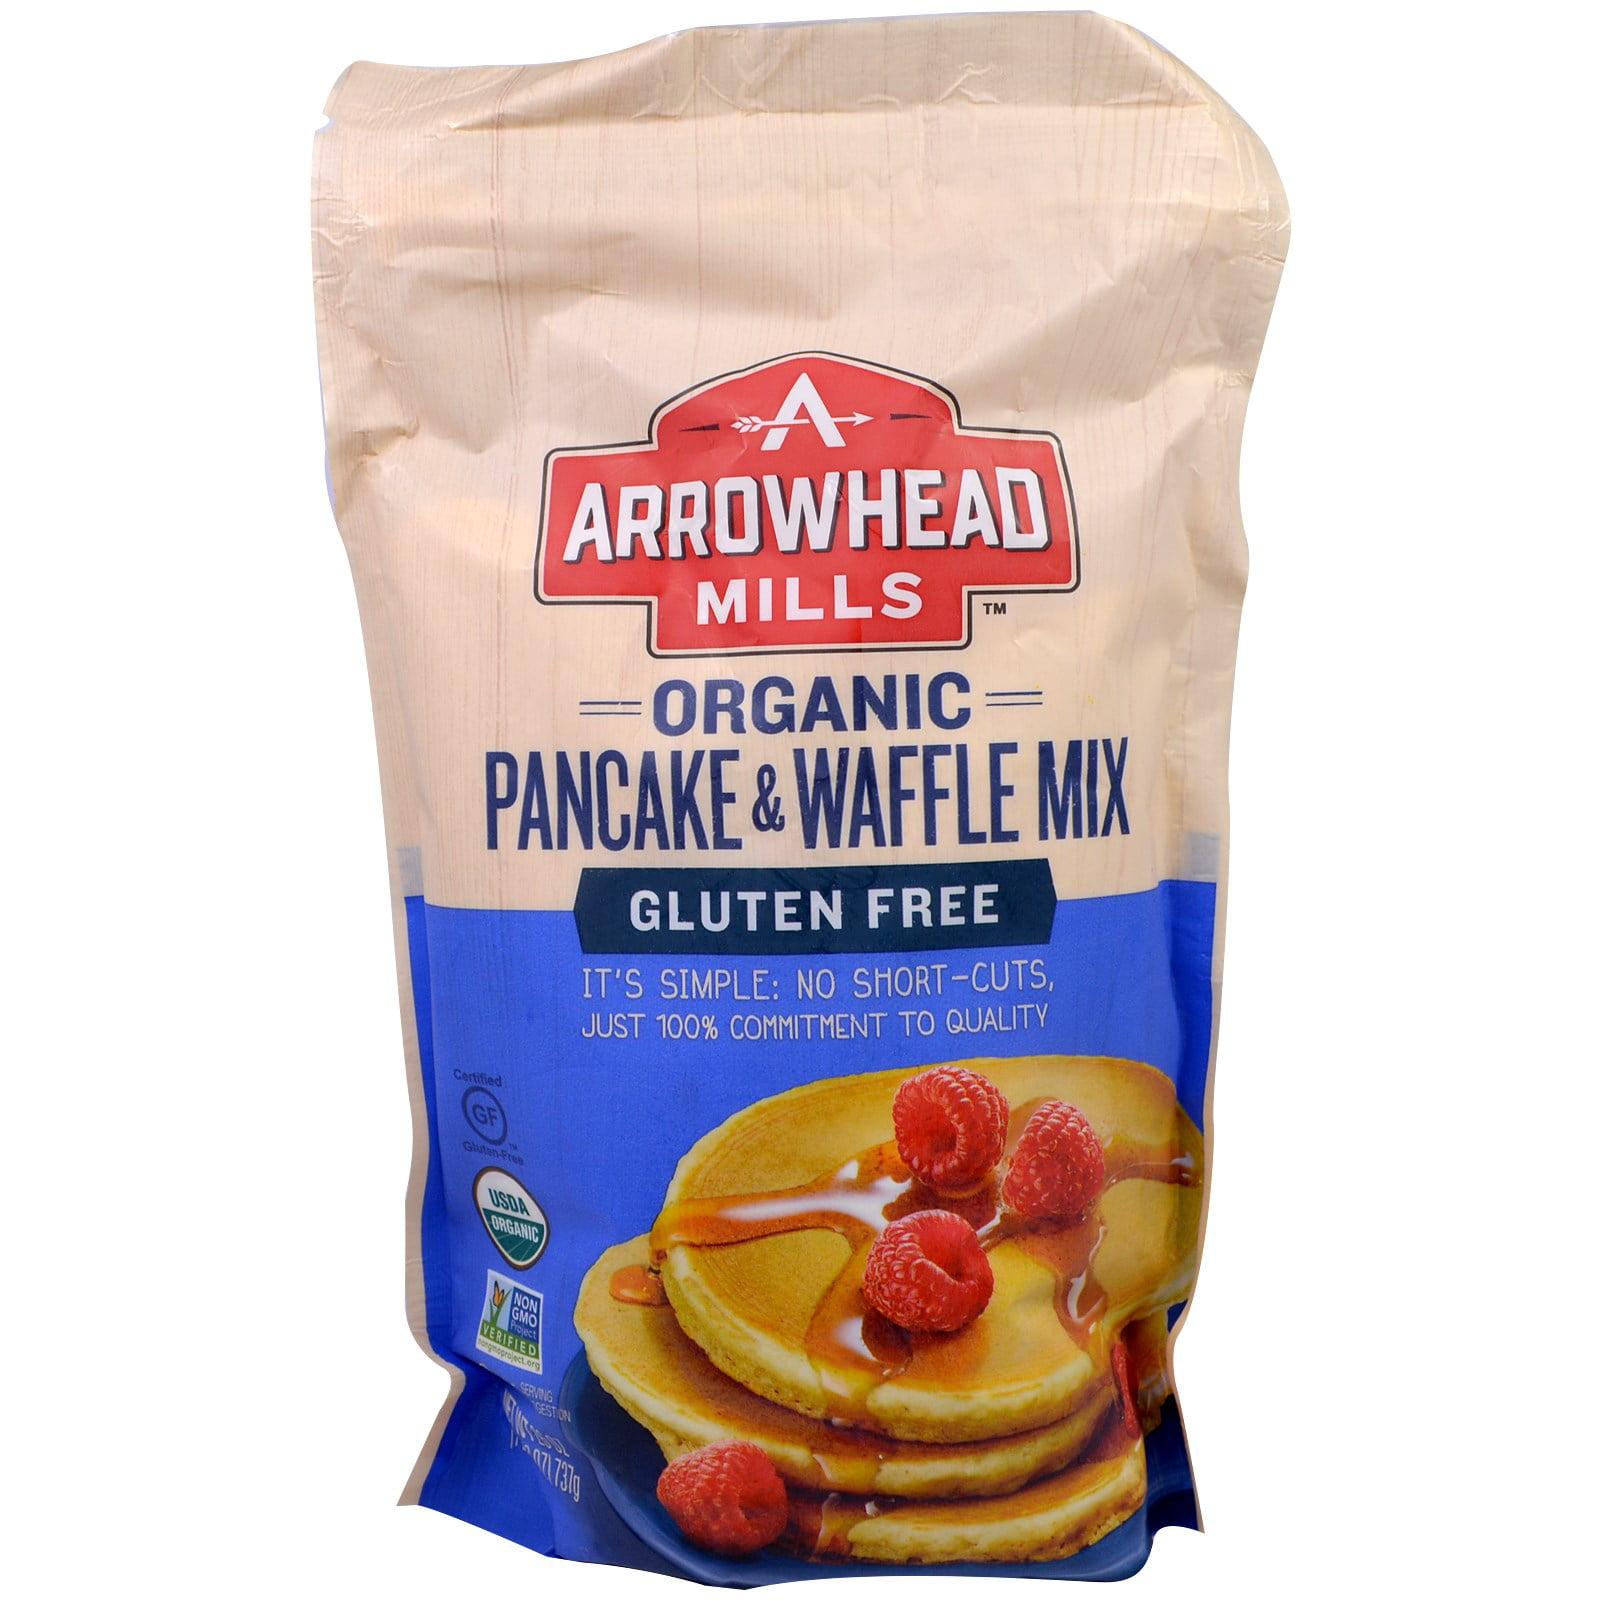 Arrowhead Mills, Organic, Gluten Free, Pancake & Waffle Mix, 26 oz (pack of 4) by